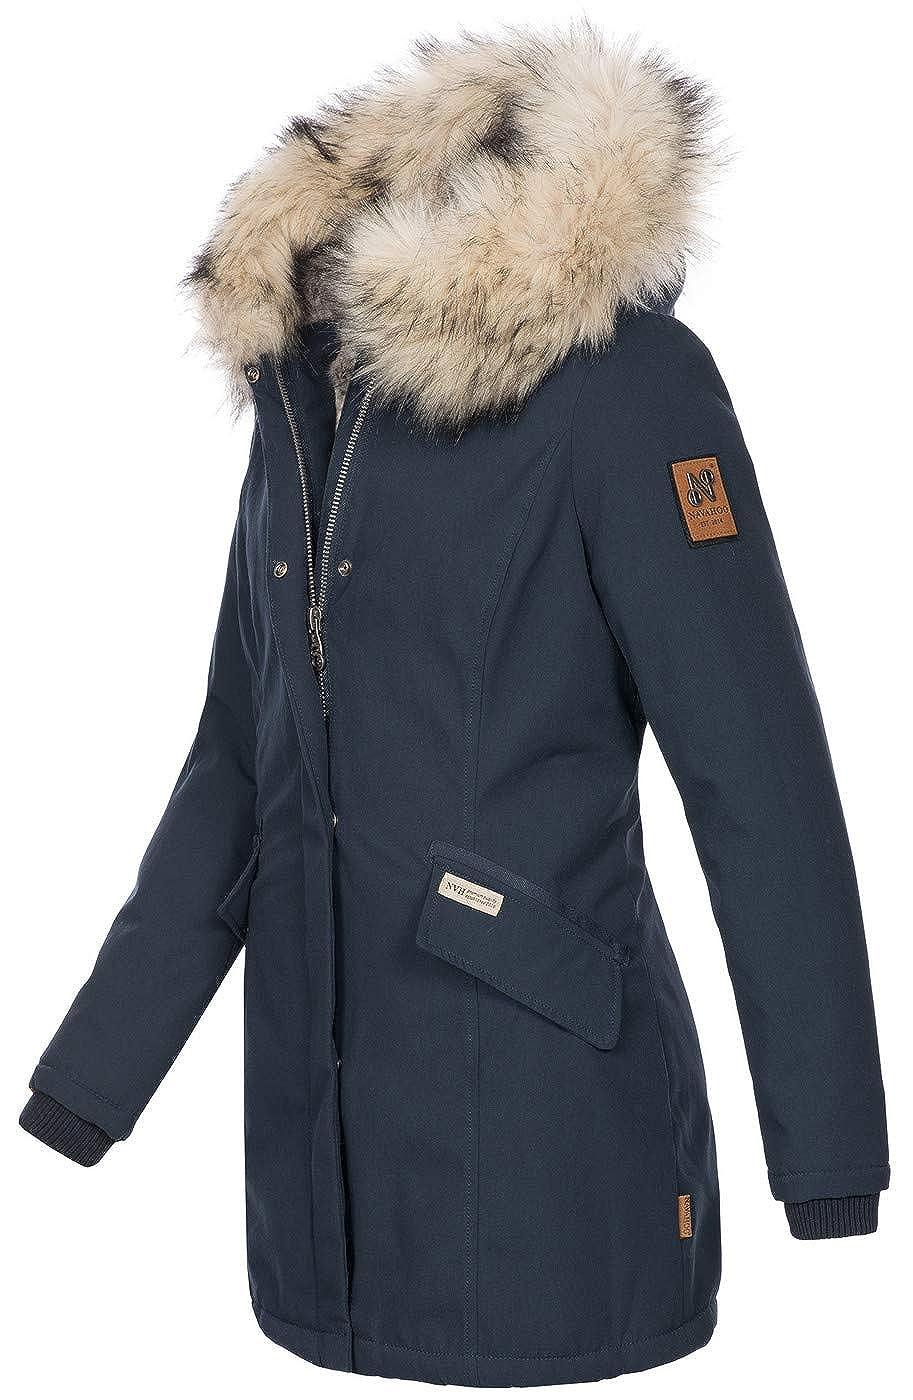 cb46a720caa44 Navahoo Damen Winter Jacke Parka Mantel Winterjacke warm Kunstfell Premium  B669: Amazon.de: Bekleidung